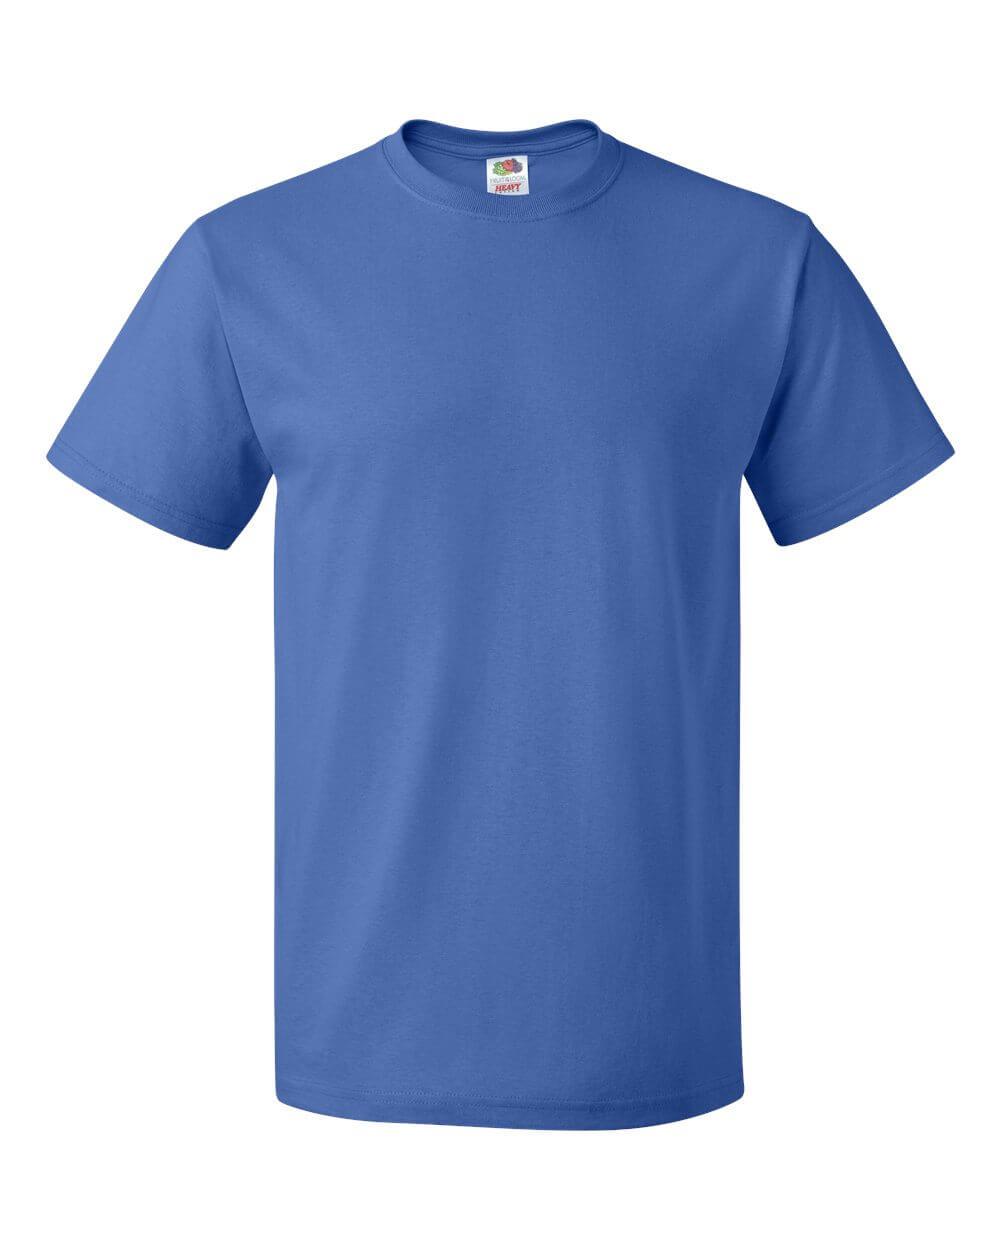 Fruit_of_the_Loom_3930R_Royal Blue Custom T Shirts